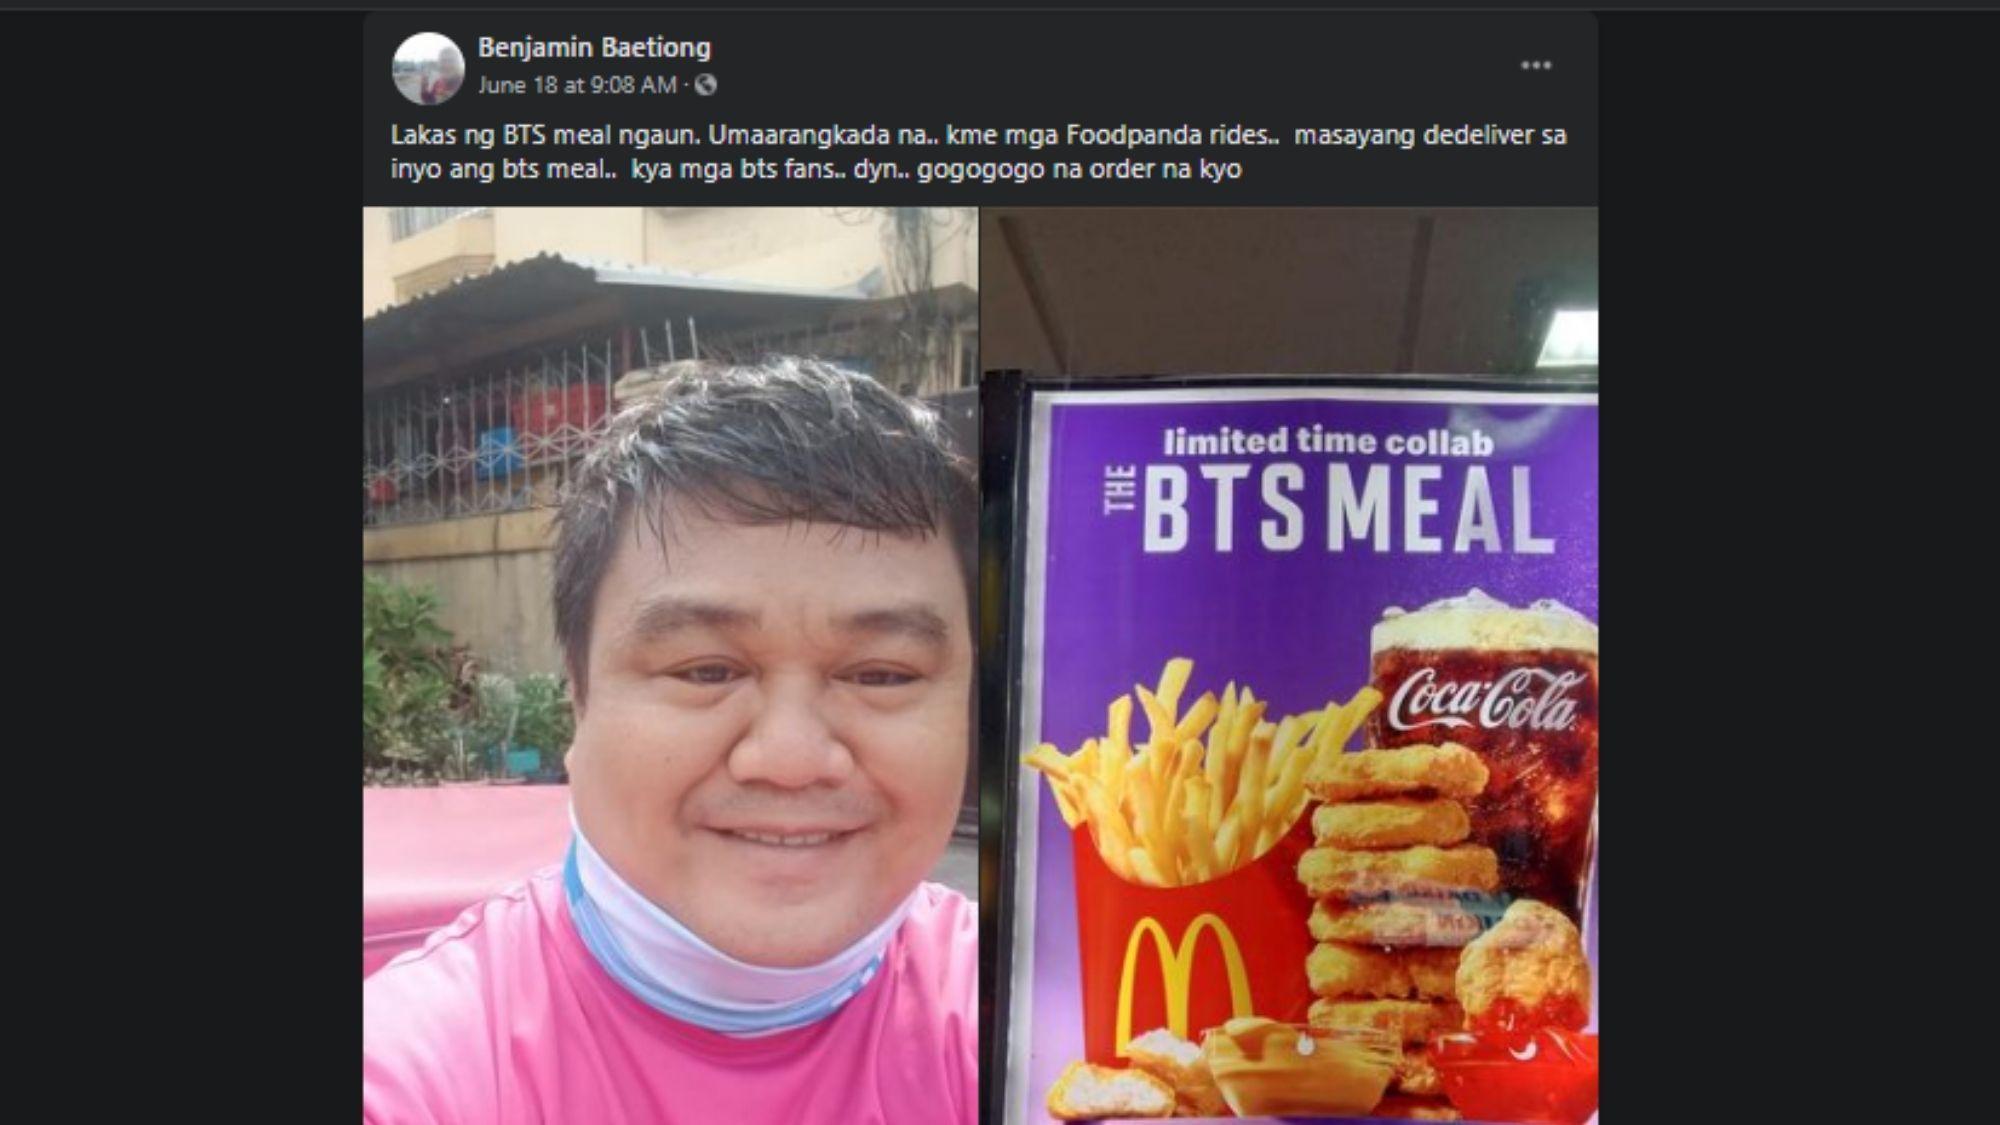 McDonald's PH and Benjamin Baetiong are sending purple hearts everywhere